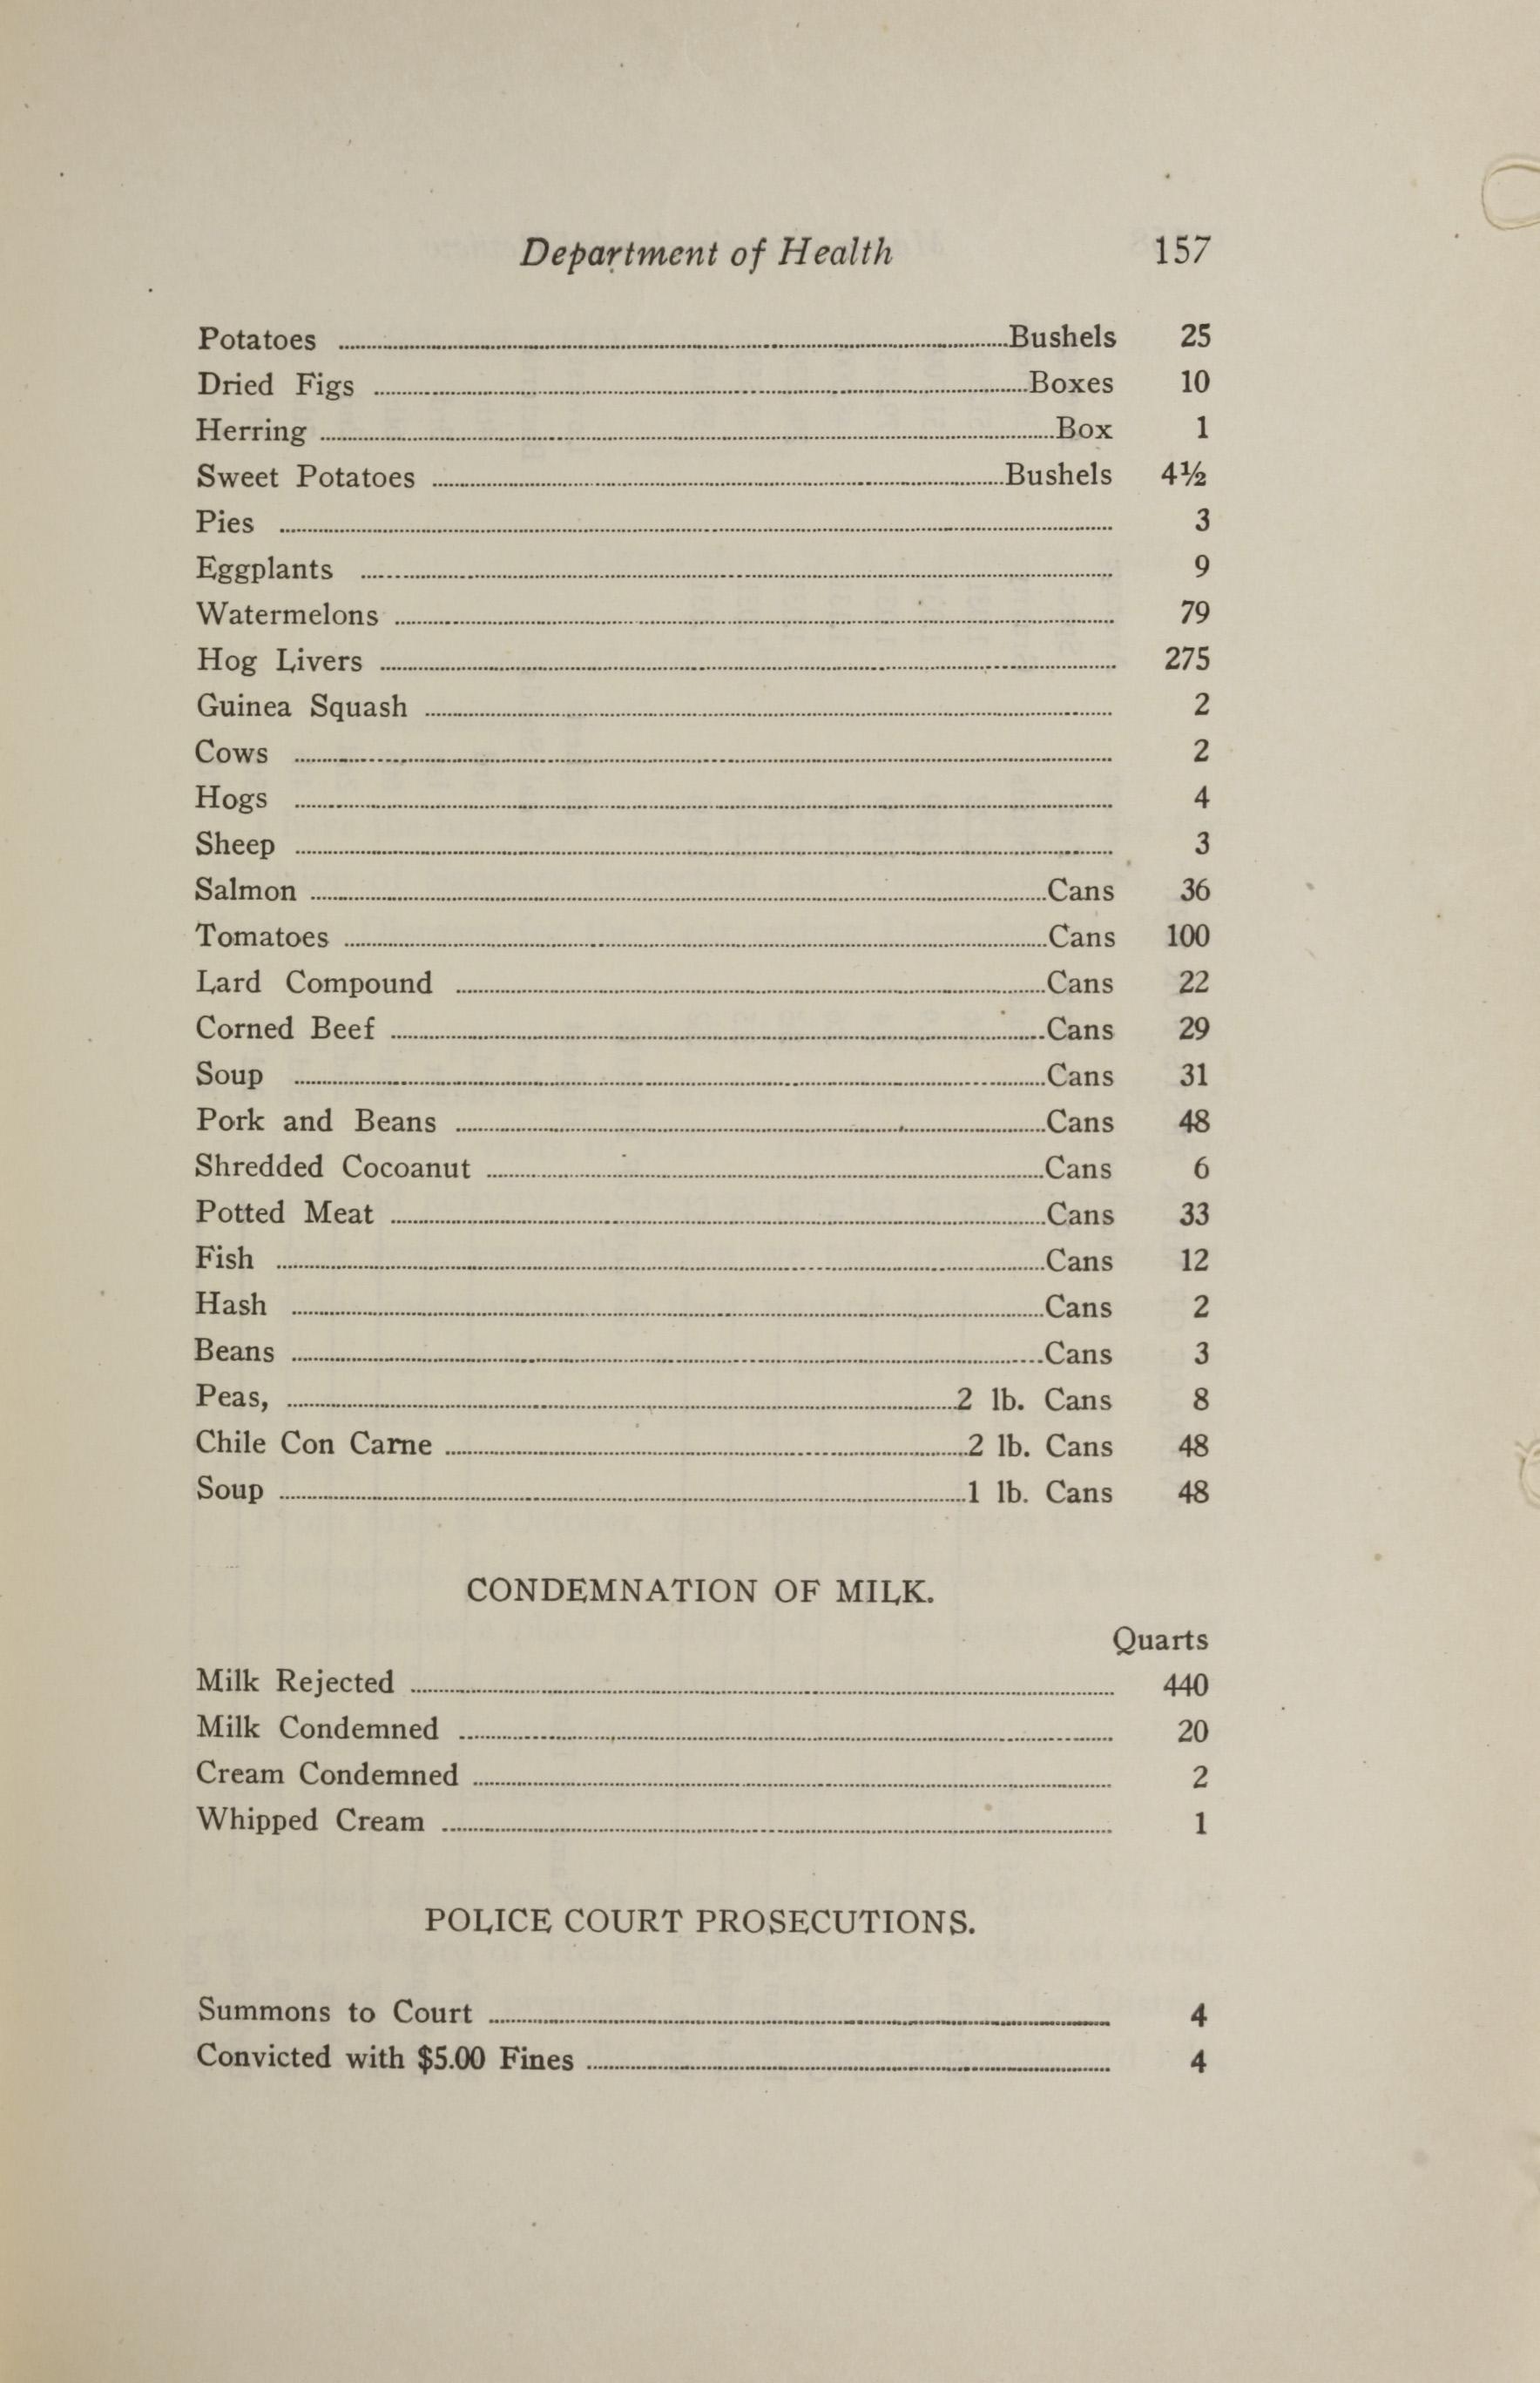 Charleston Yearbook, 1921, page 157